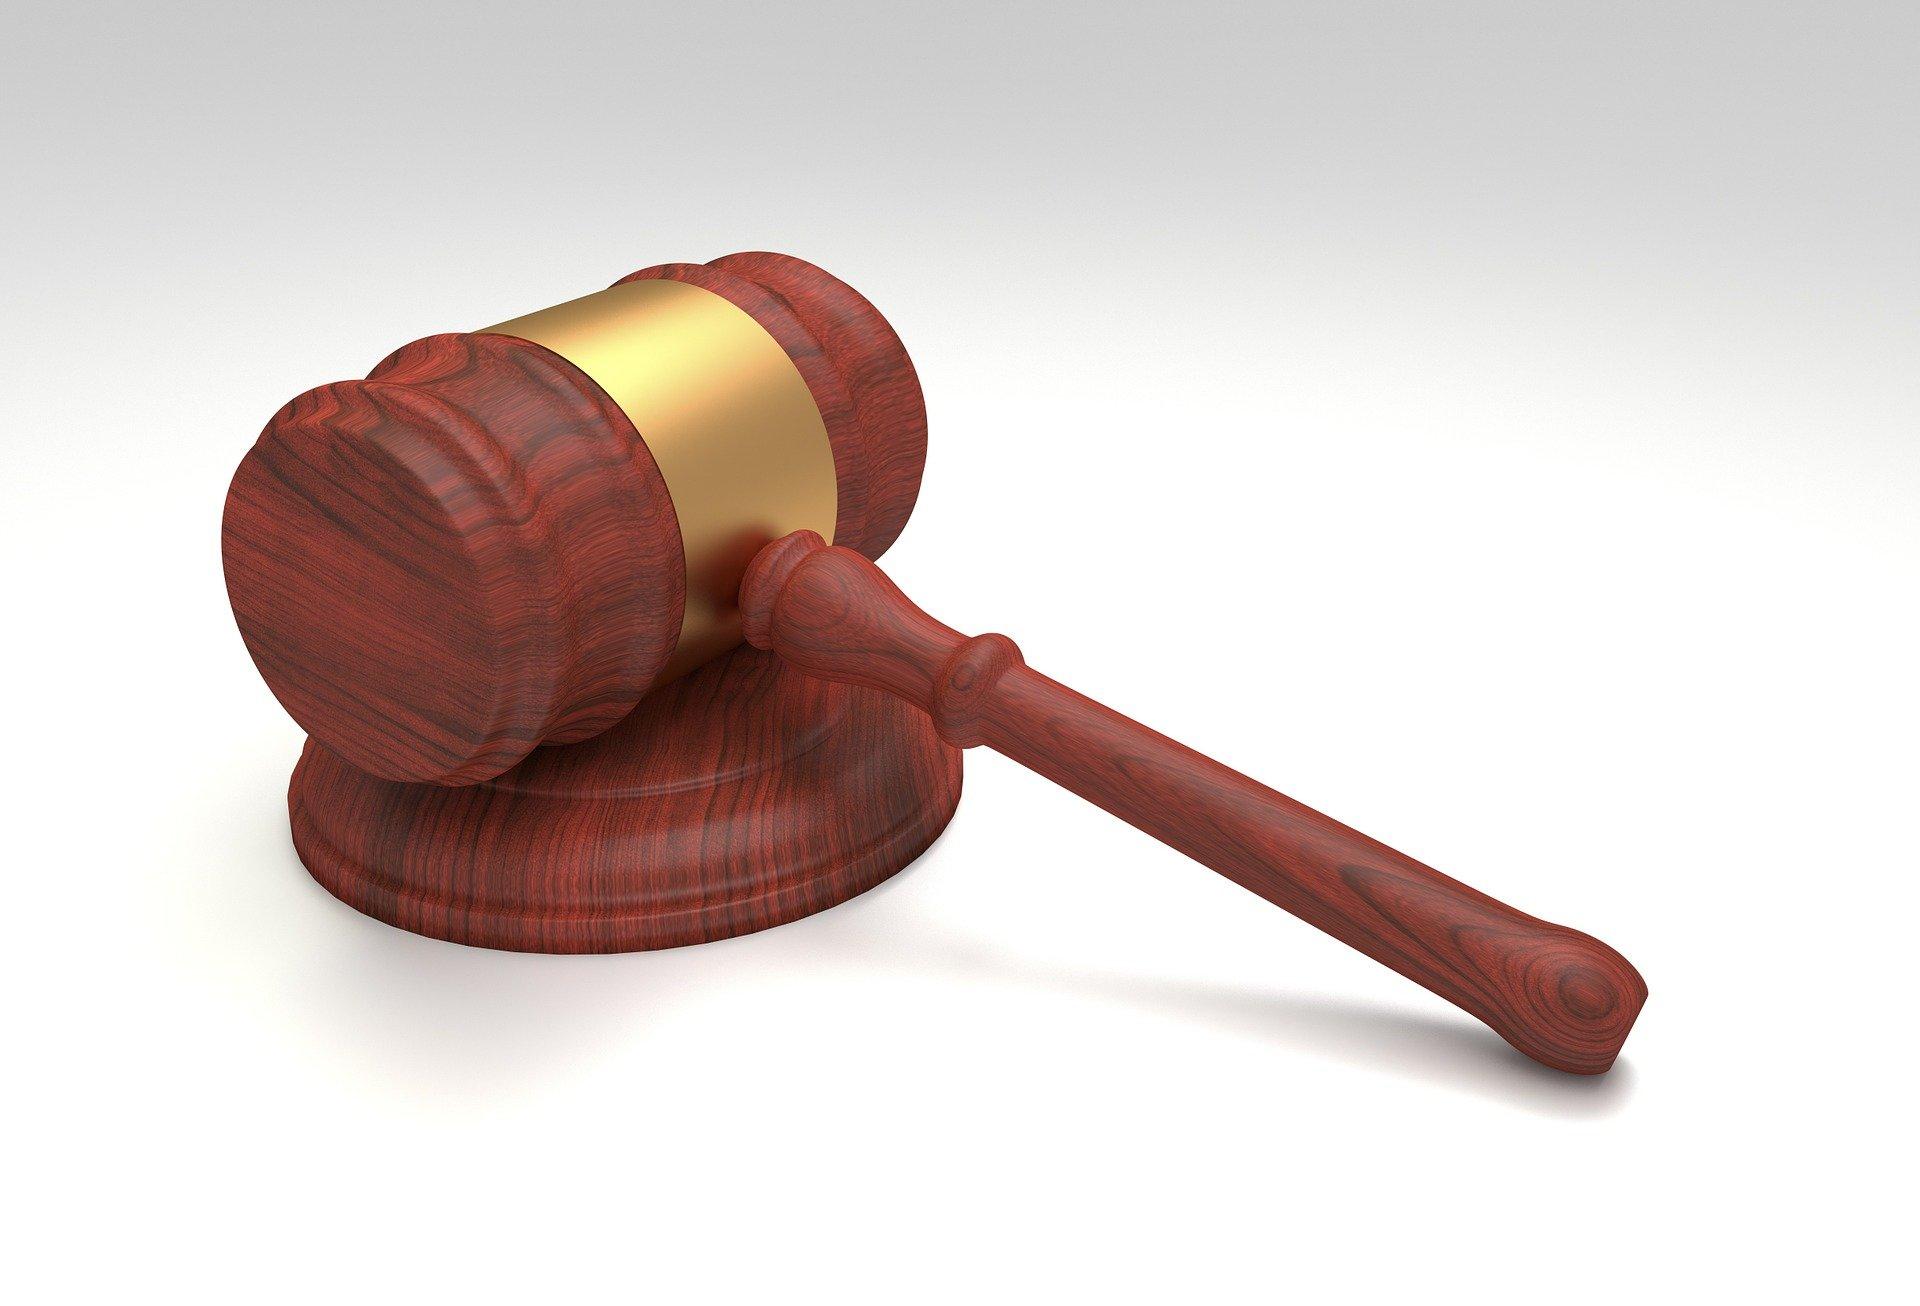 Is Cook V SCPSA a Scam? Class Action Lawsuit